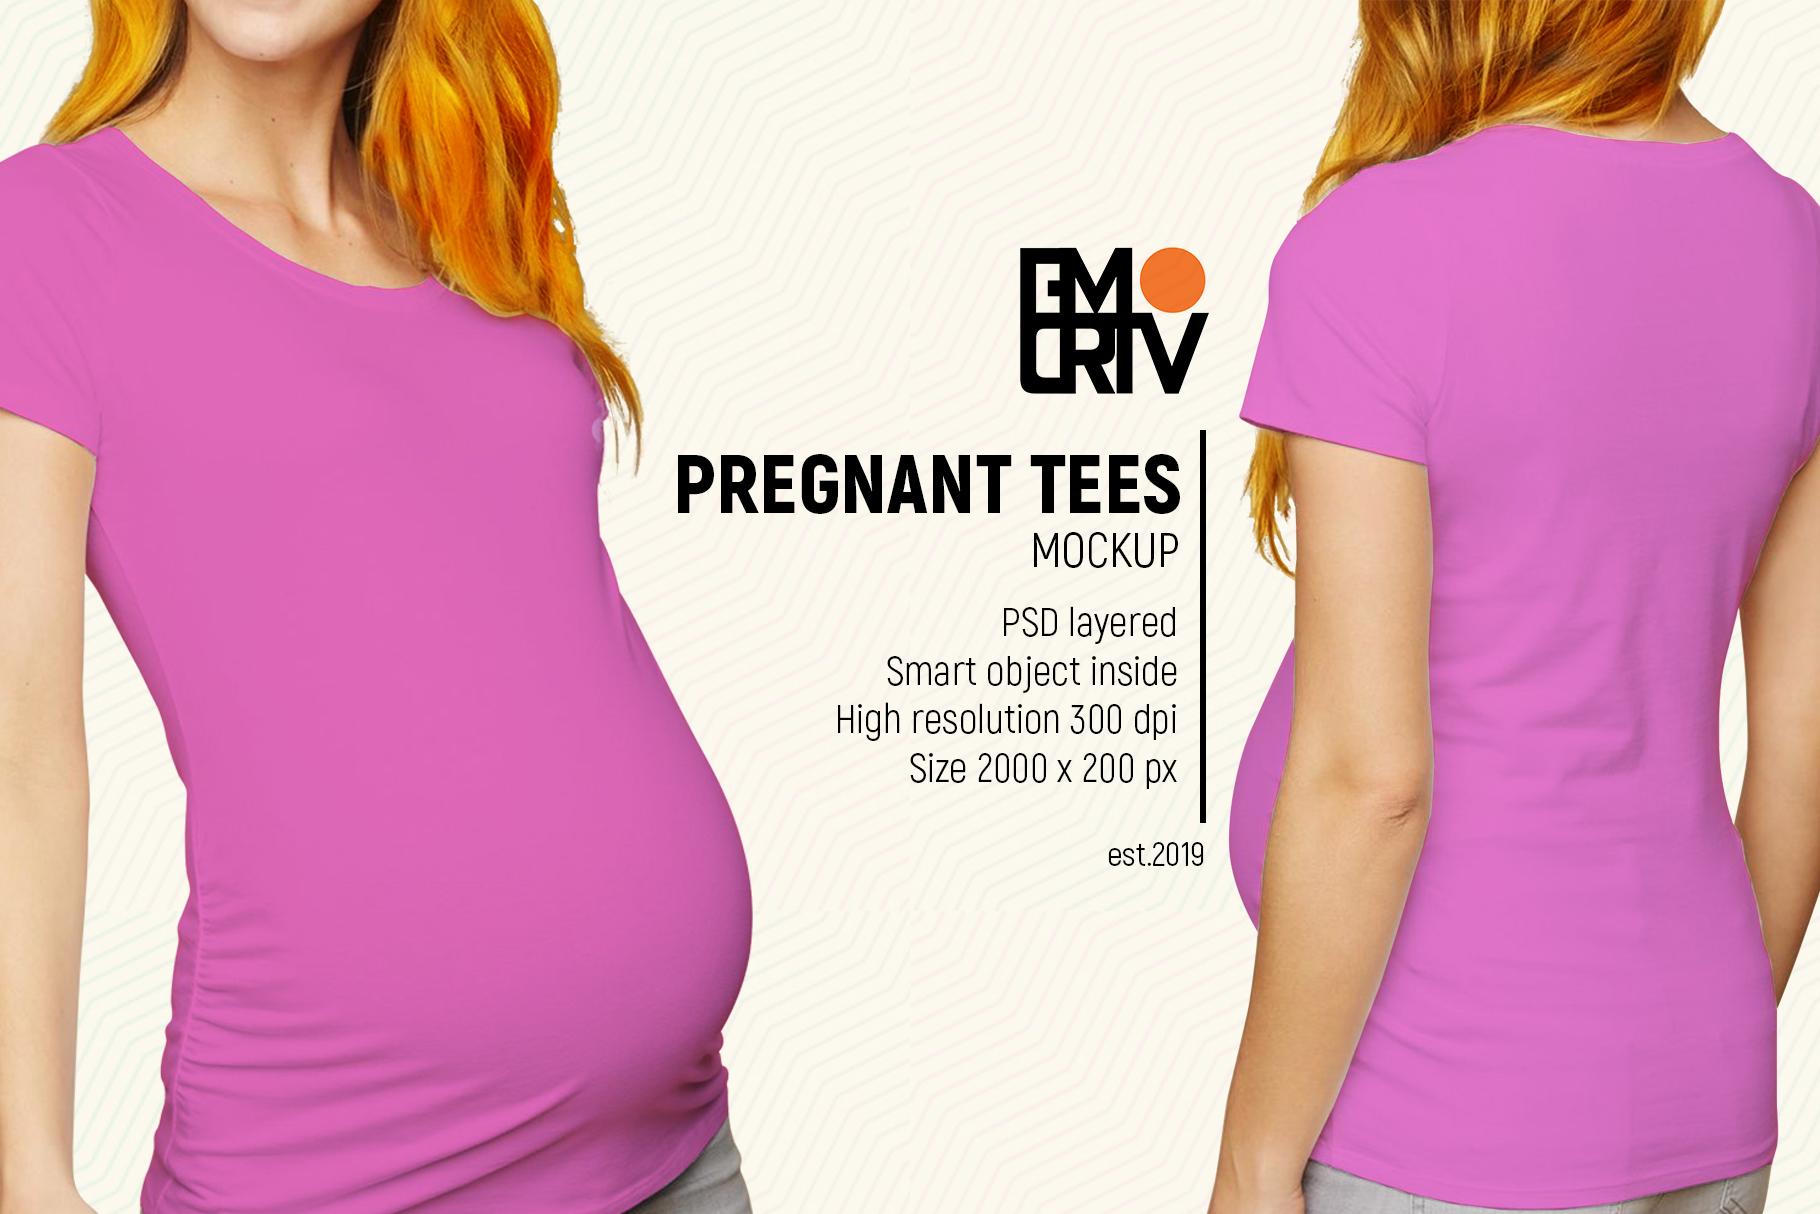 Pregnant Tees Mockup example image 3